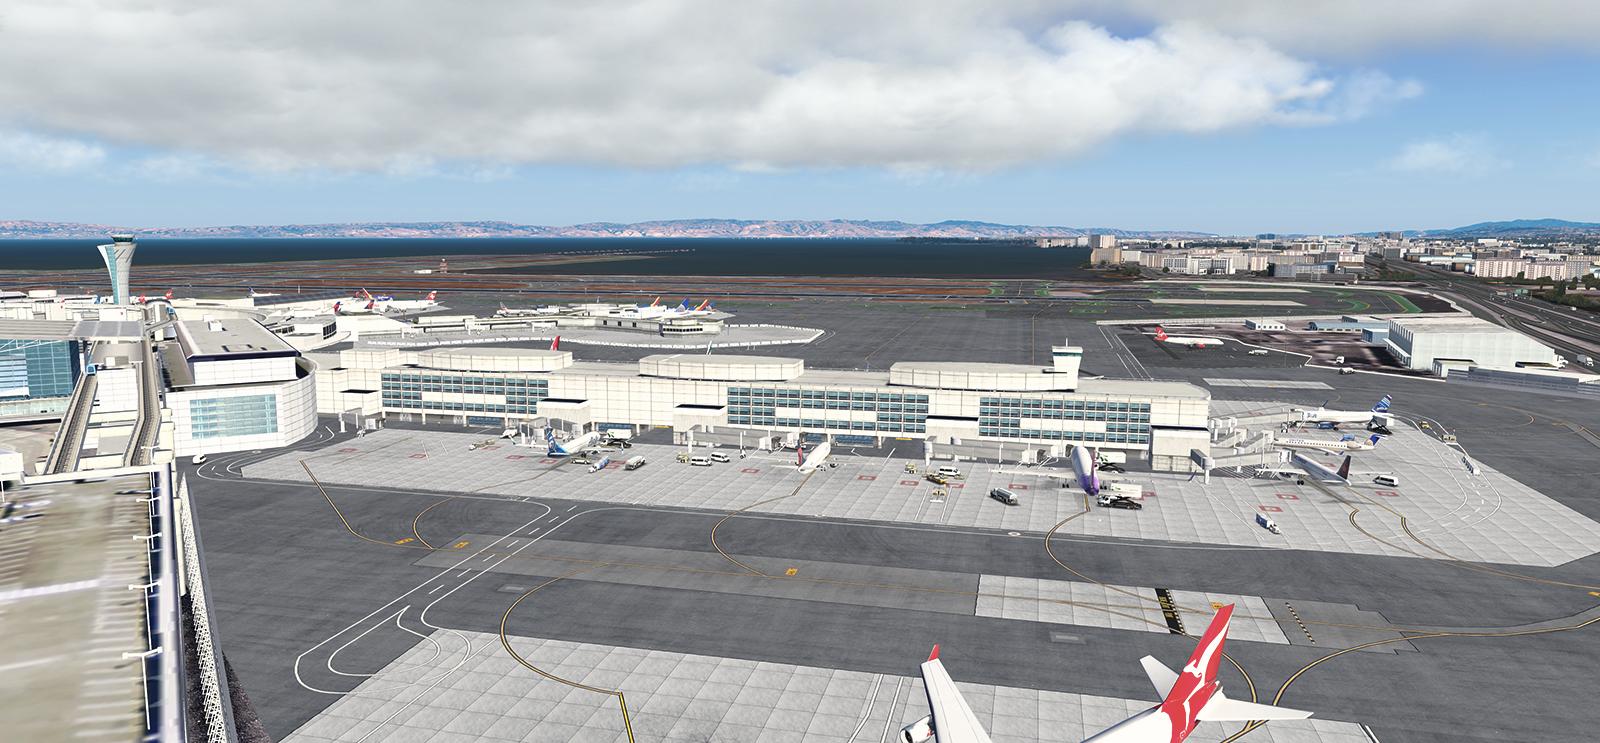 A320 - 2019-12-14 06